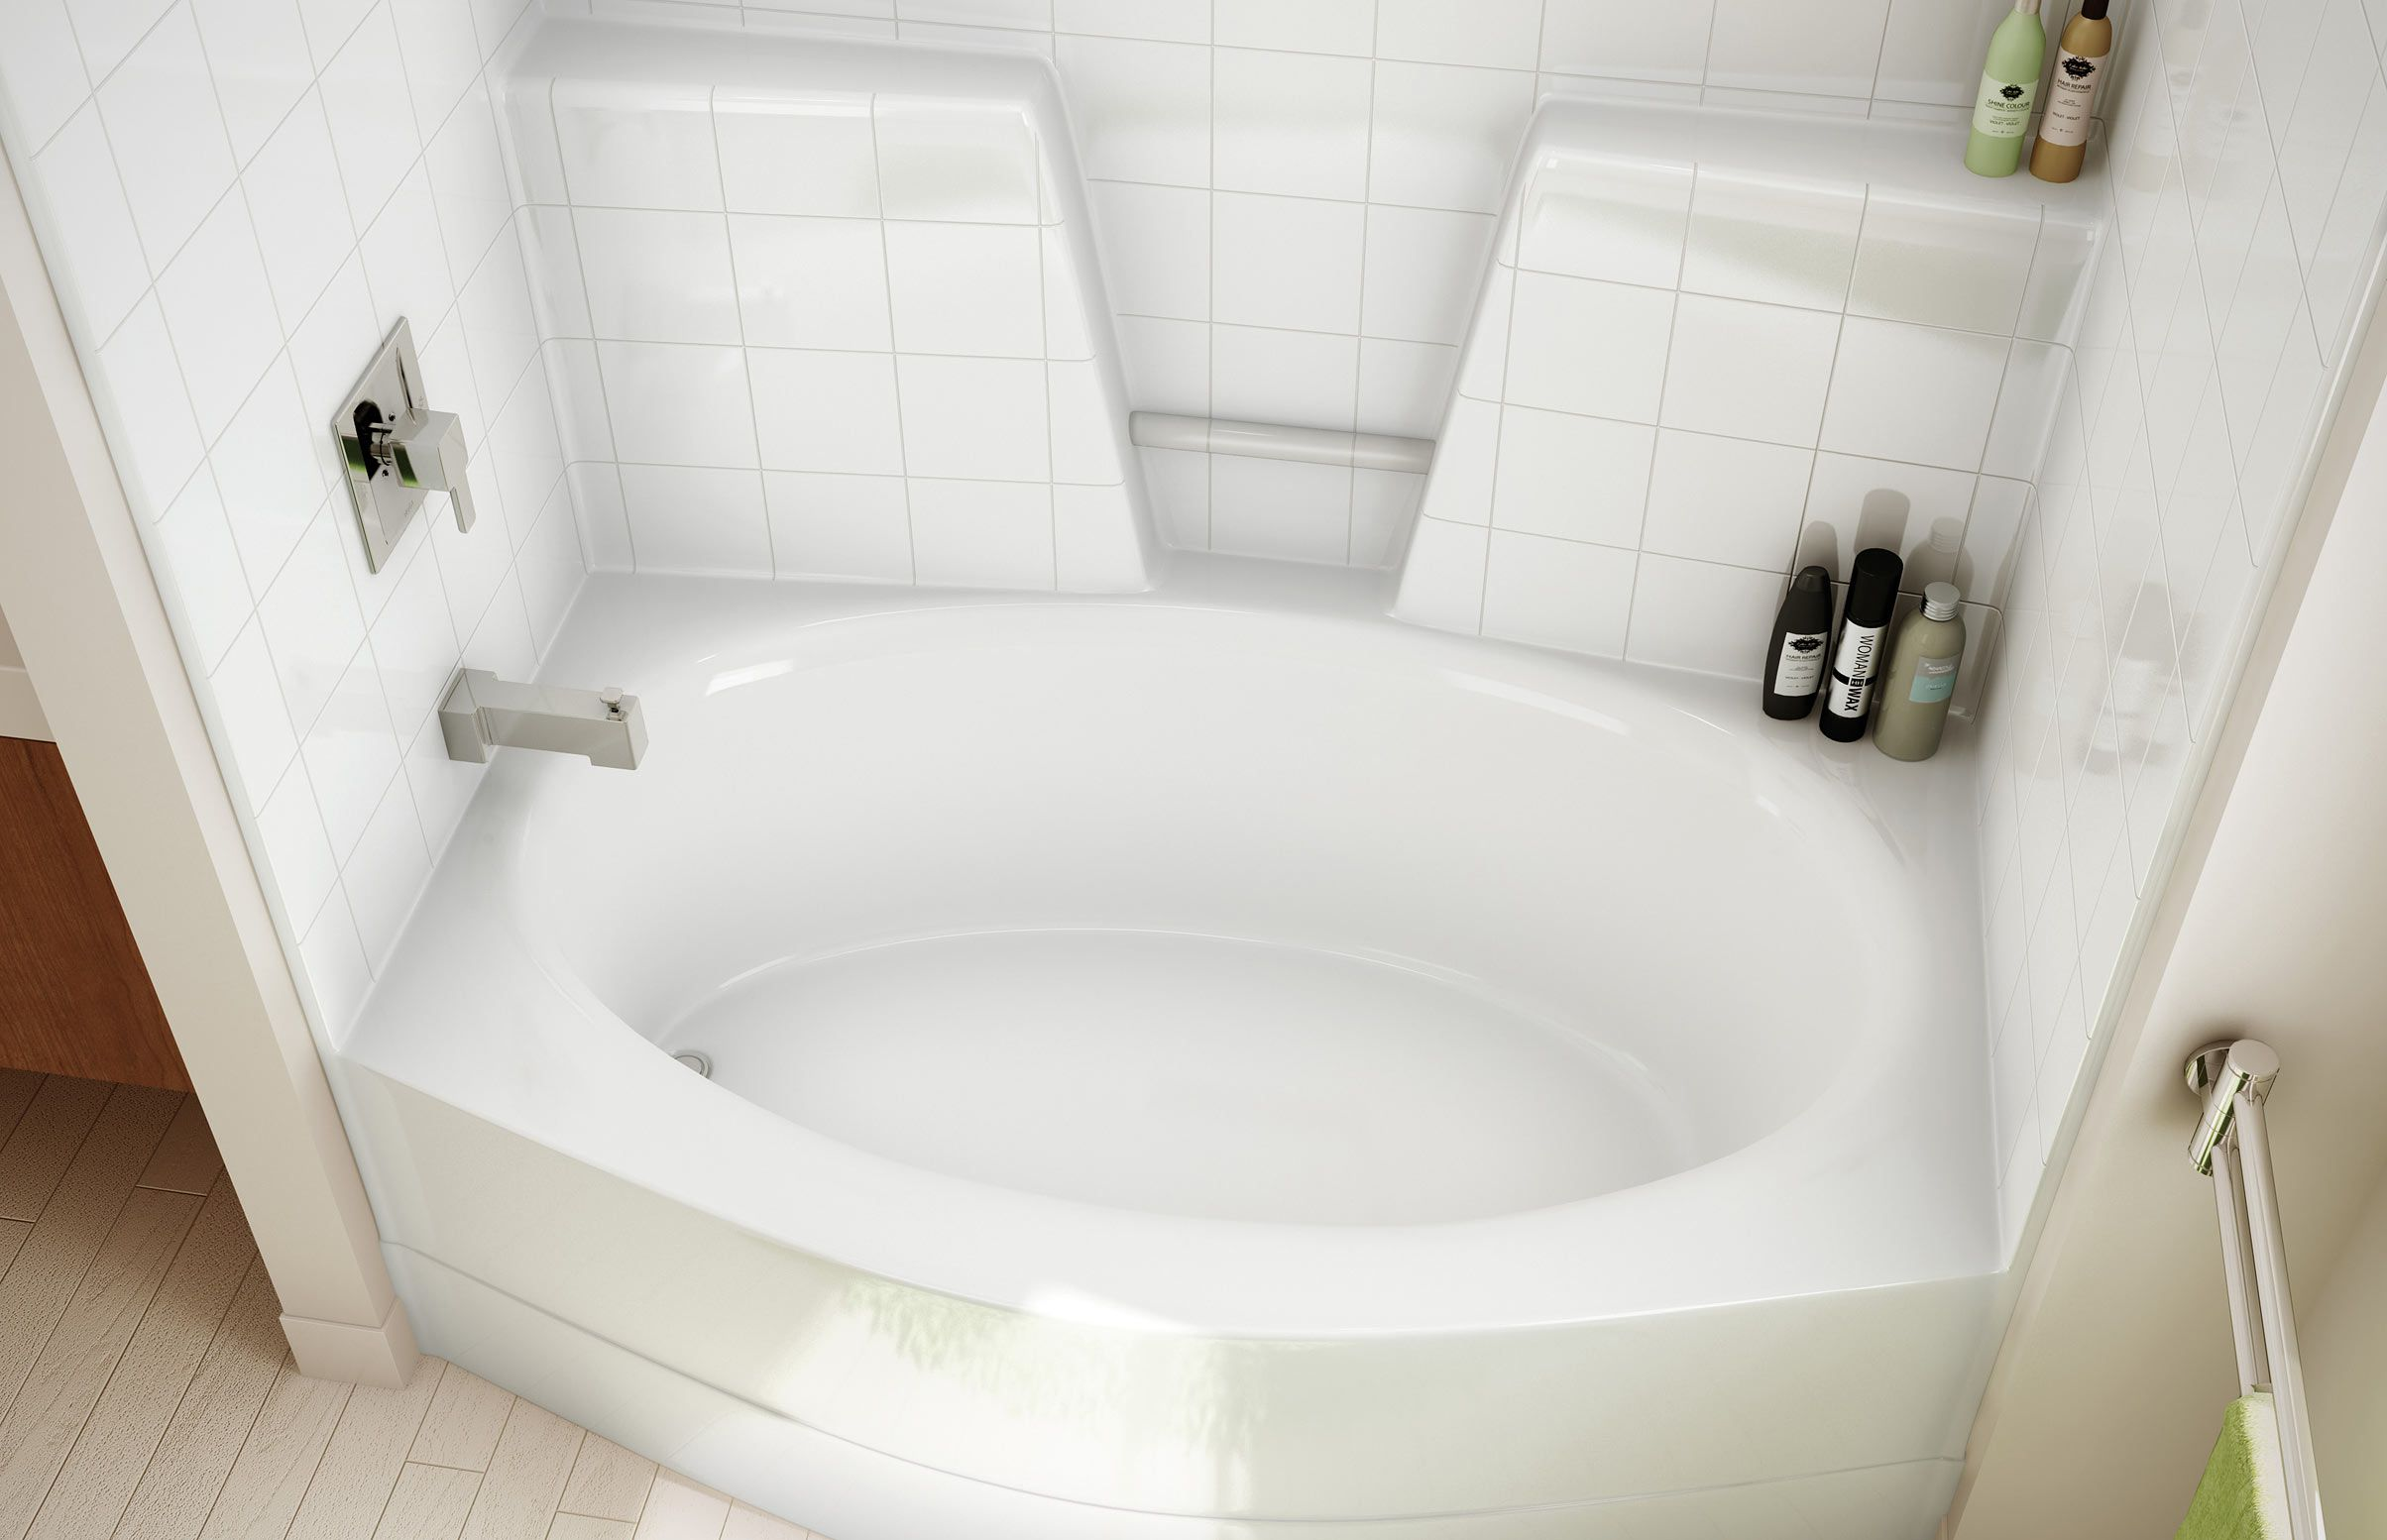 TSOT6042 Alcove or Tub showers bathtub - MAAX Professional ...